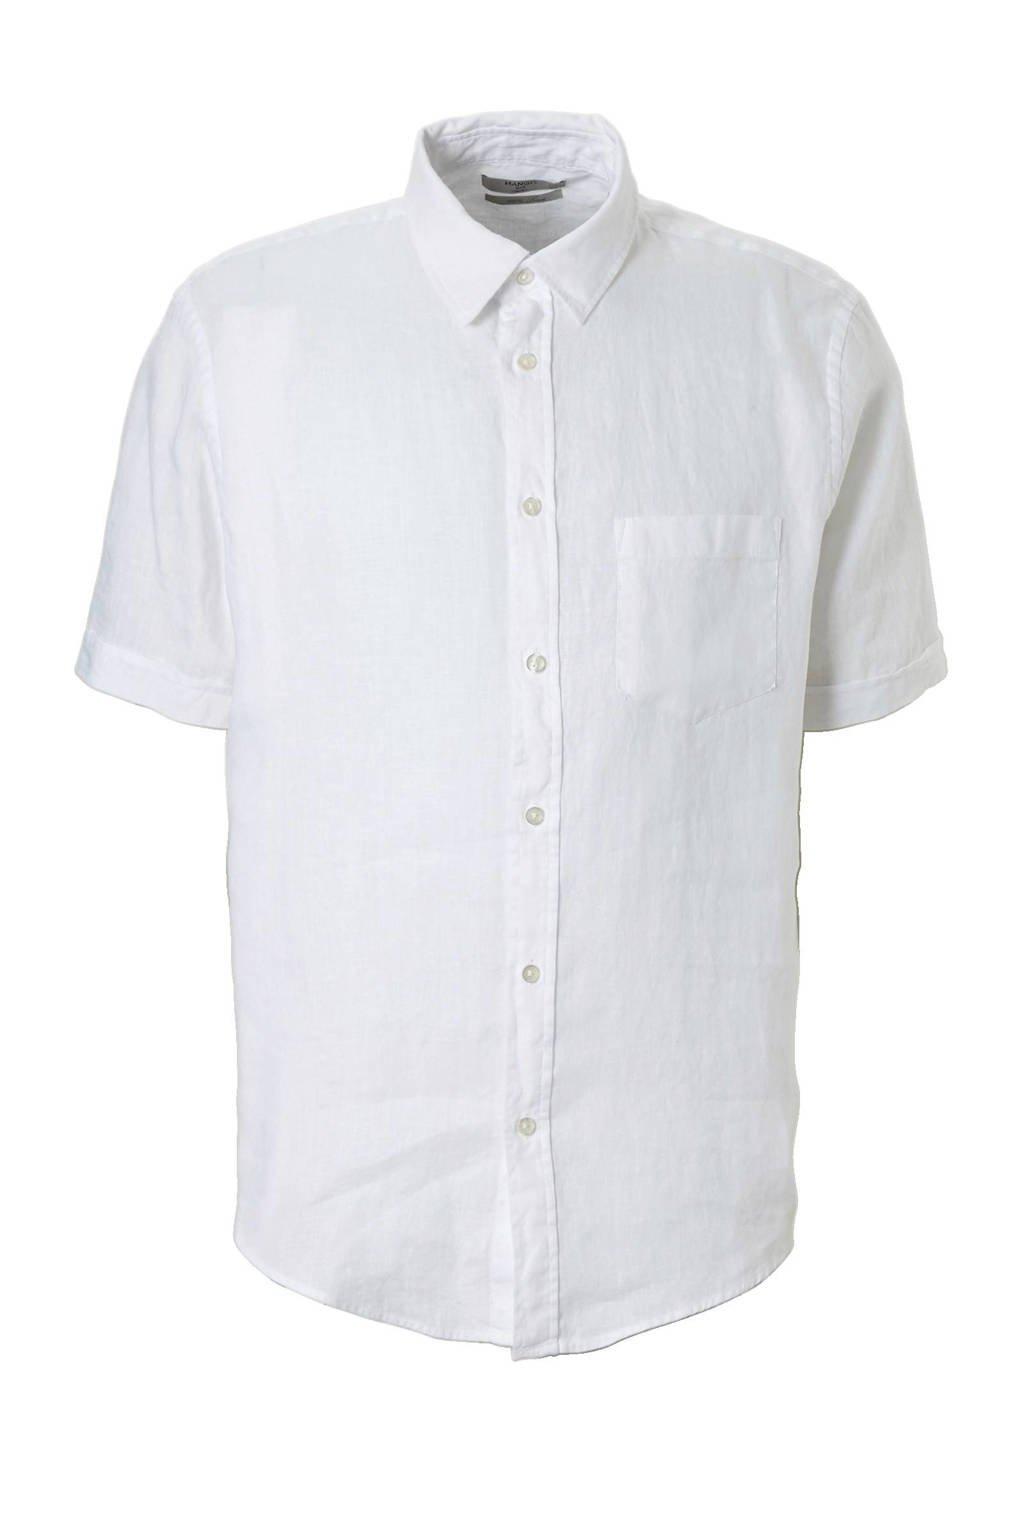 Linnen Overhemd Wit.Mango Man Linnen Overhemd Wit Wehkamp